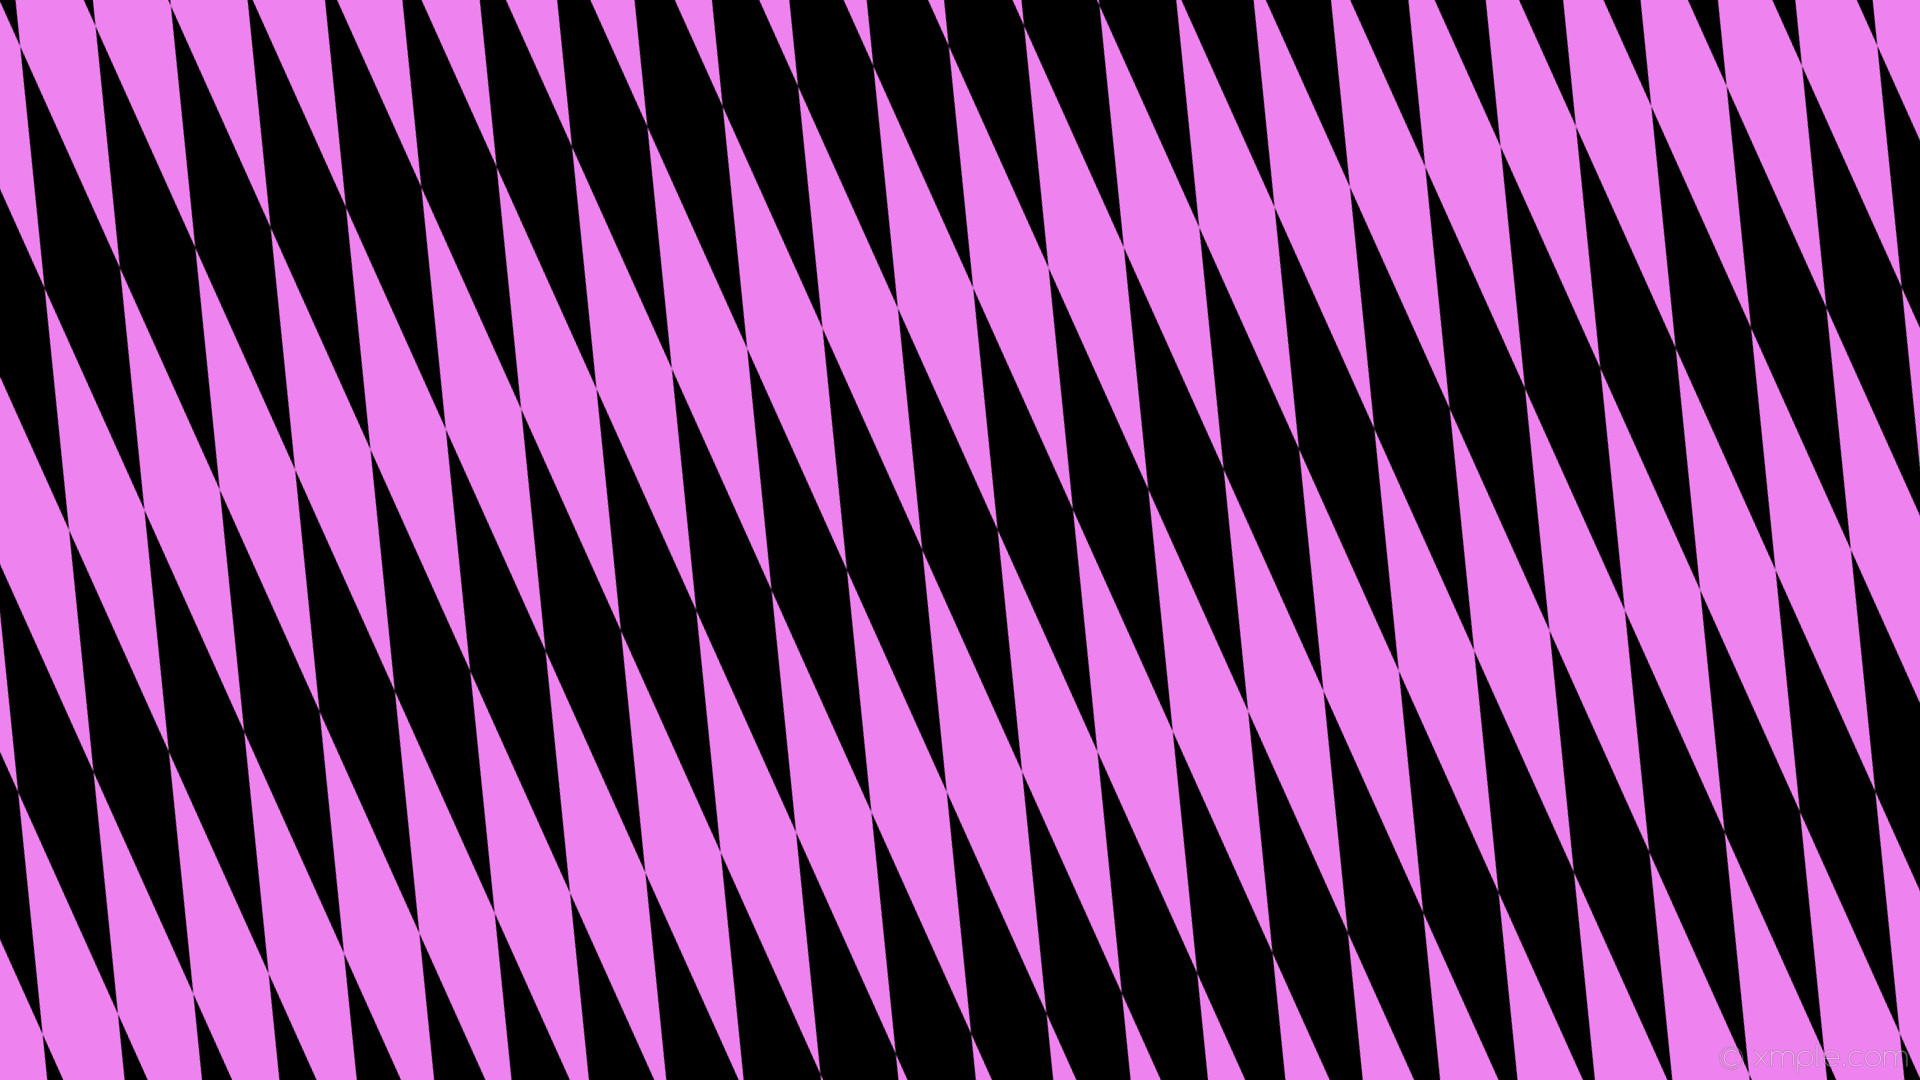 wallpaper rhombus lozenge black purple diamond violet #000000 #ee82ee 105°  480px 78px